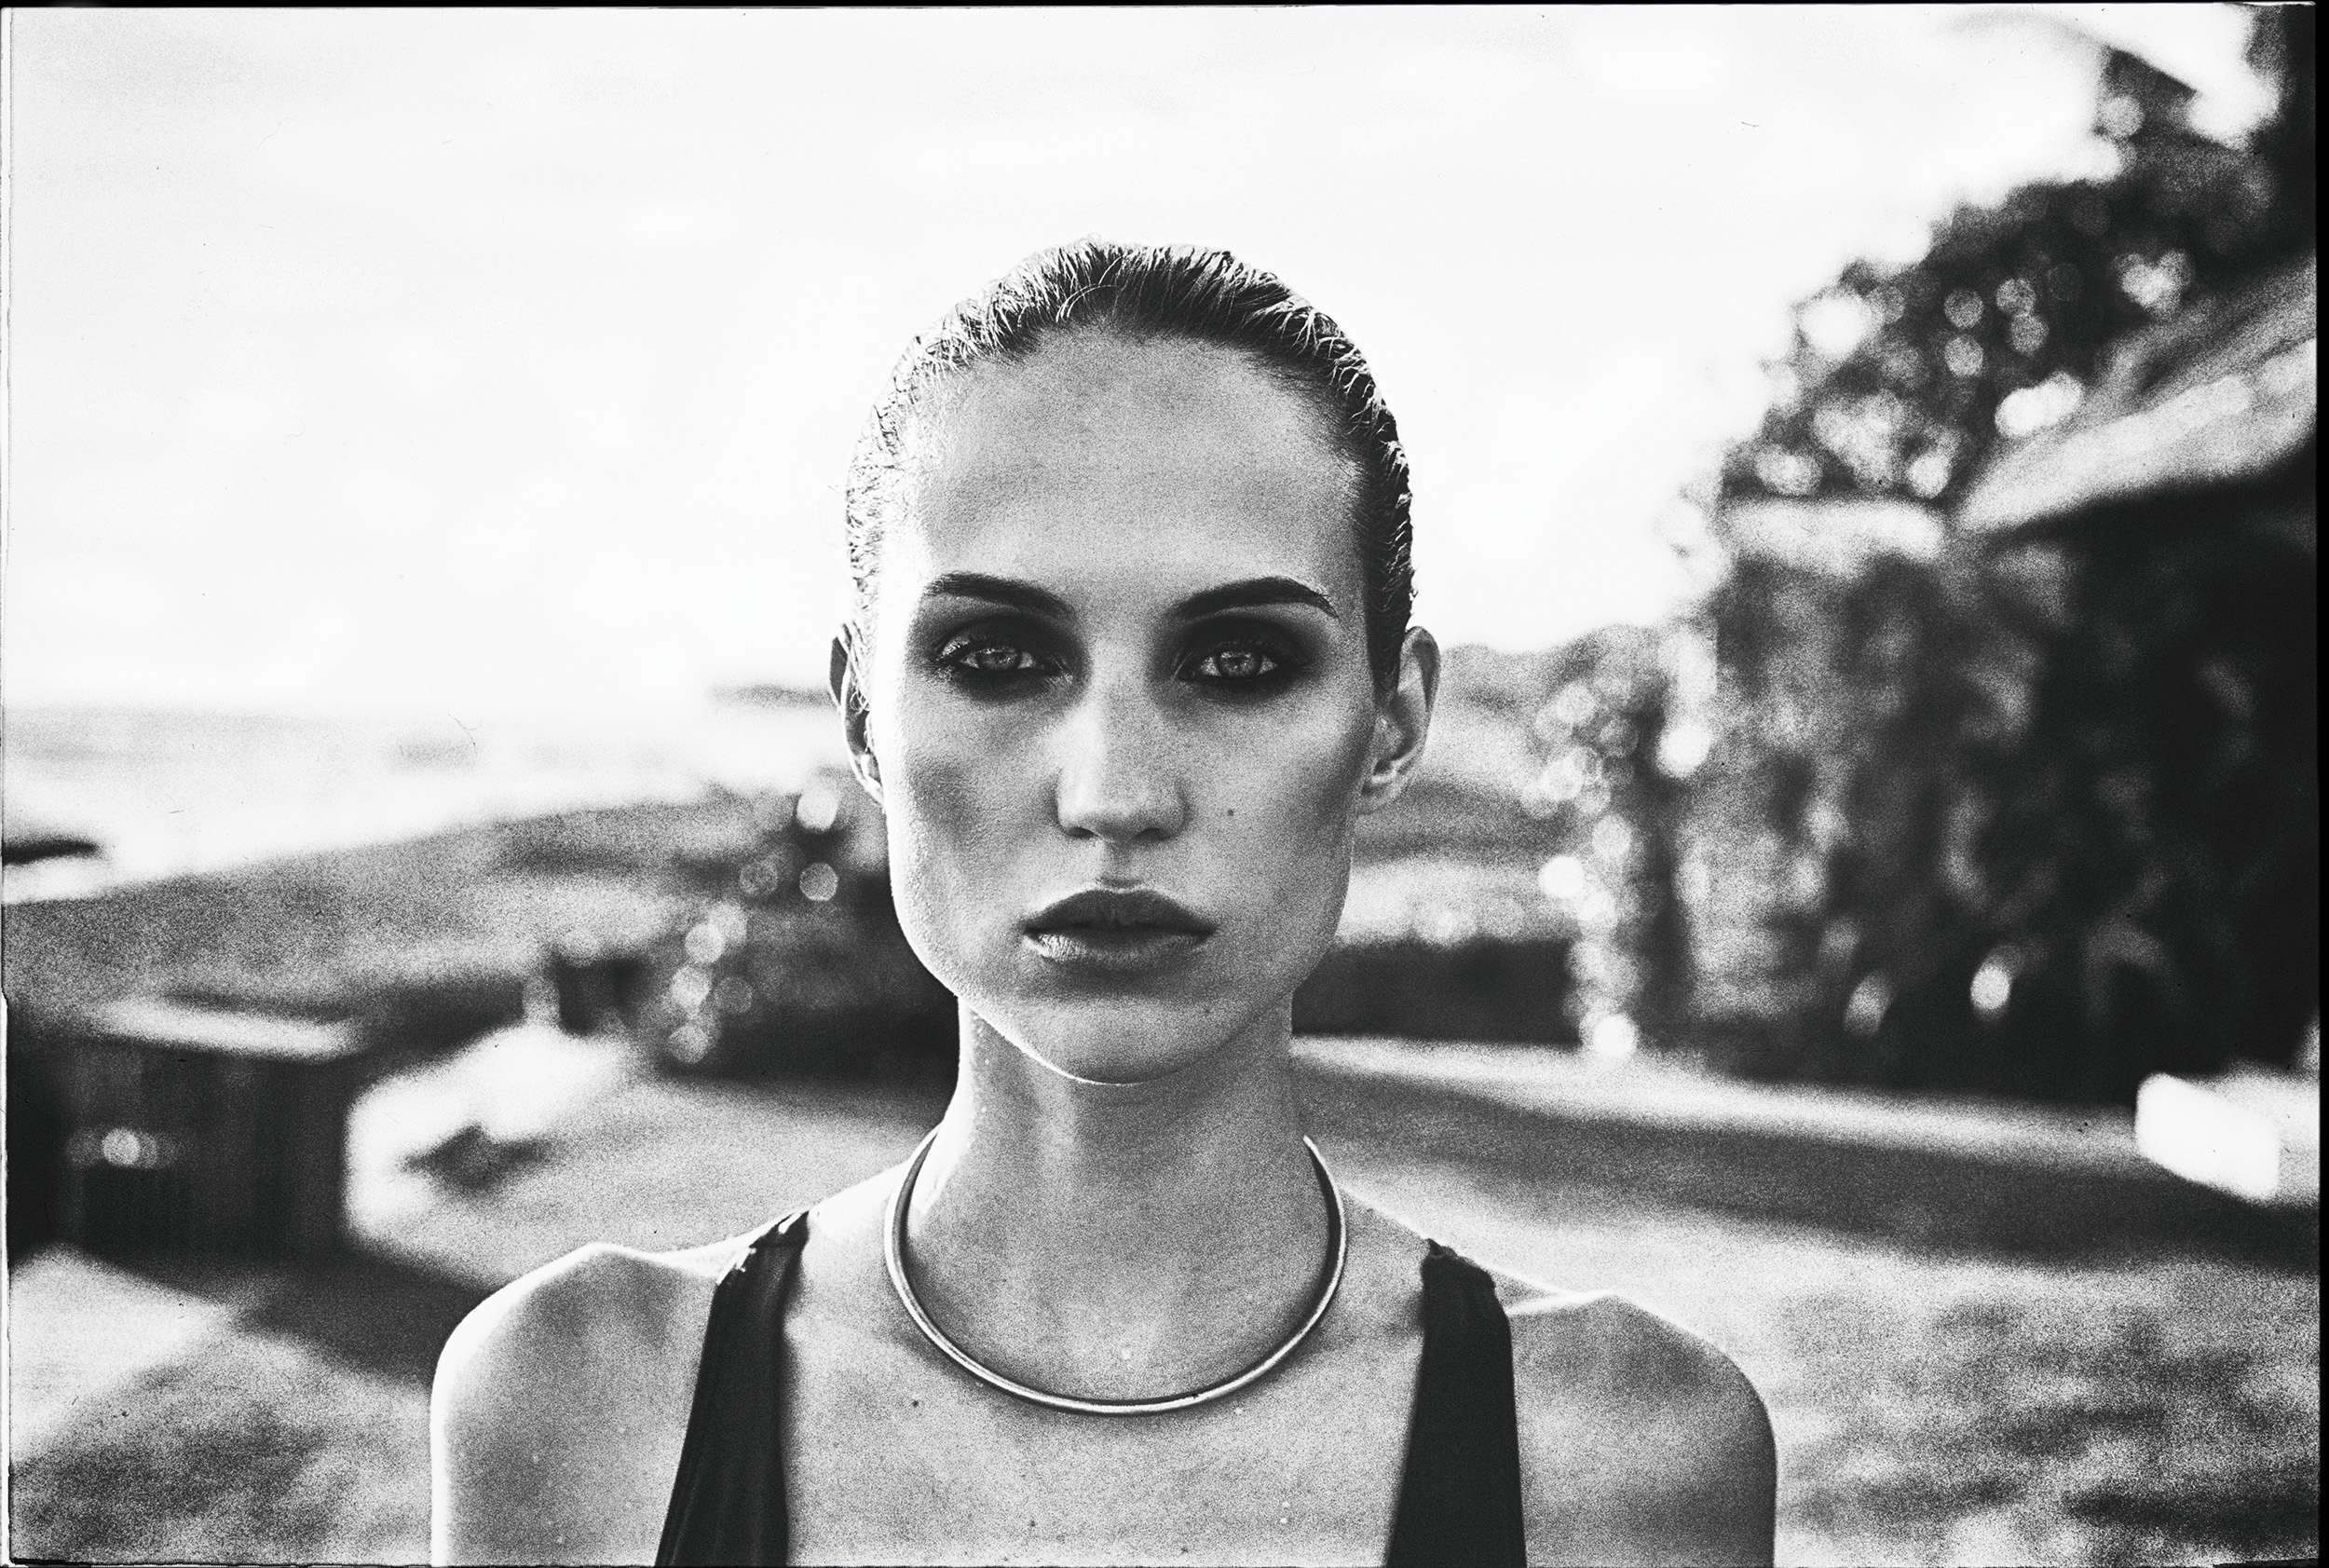 Commercial_Assignment_Bali_2018_Julien-Balmer-Fashion-Photography.jpg